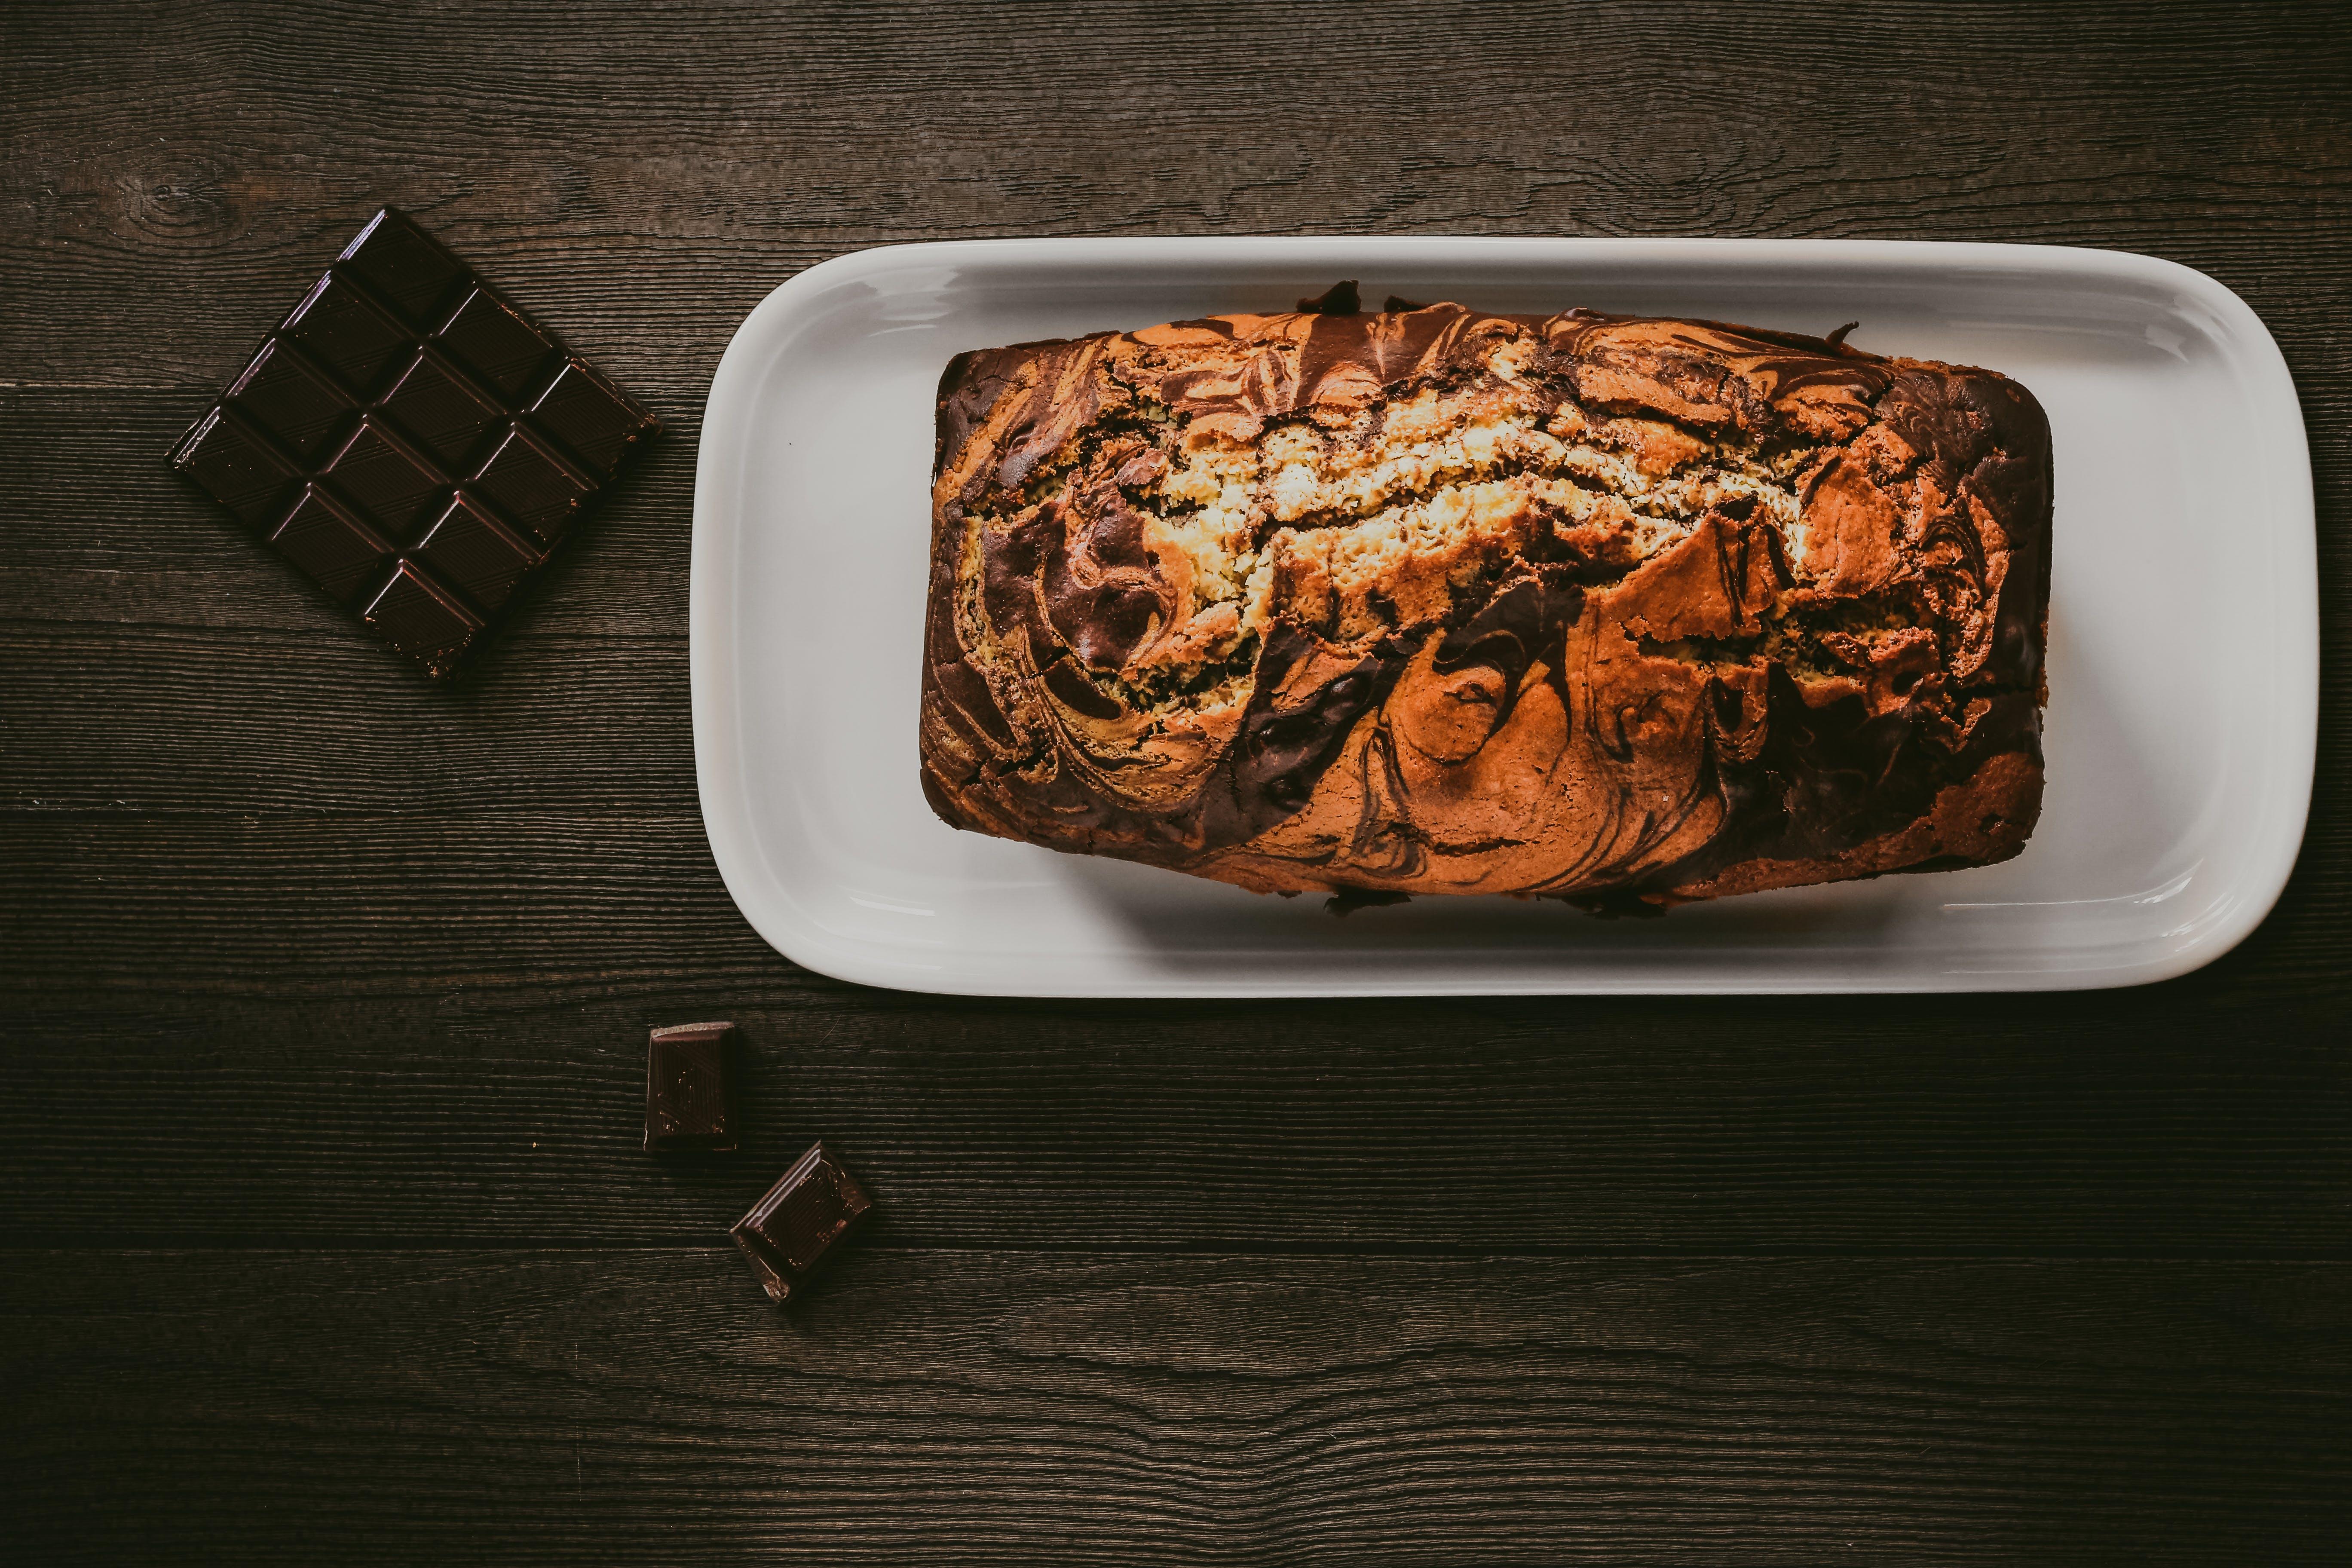 Chocolate Cake In White Plate Beside Chocolate Bars